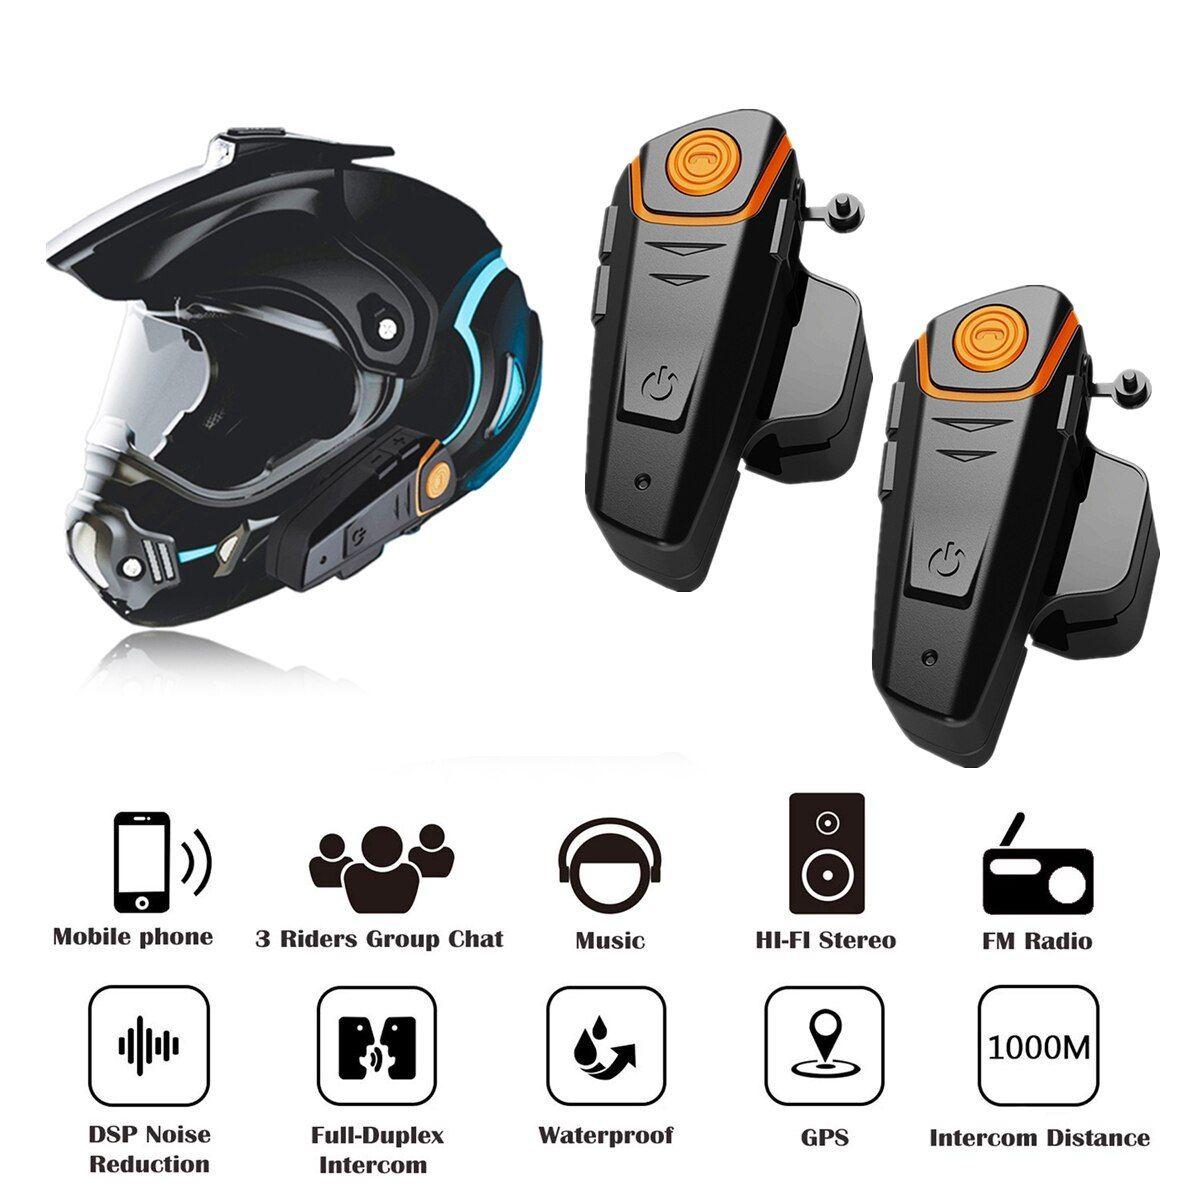 Bracket for 1000M BT Bluetooth Black Motorcycle Motorbike Helmet Intercom